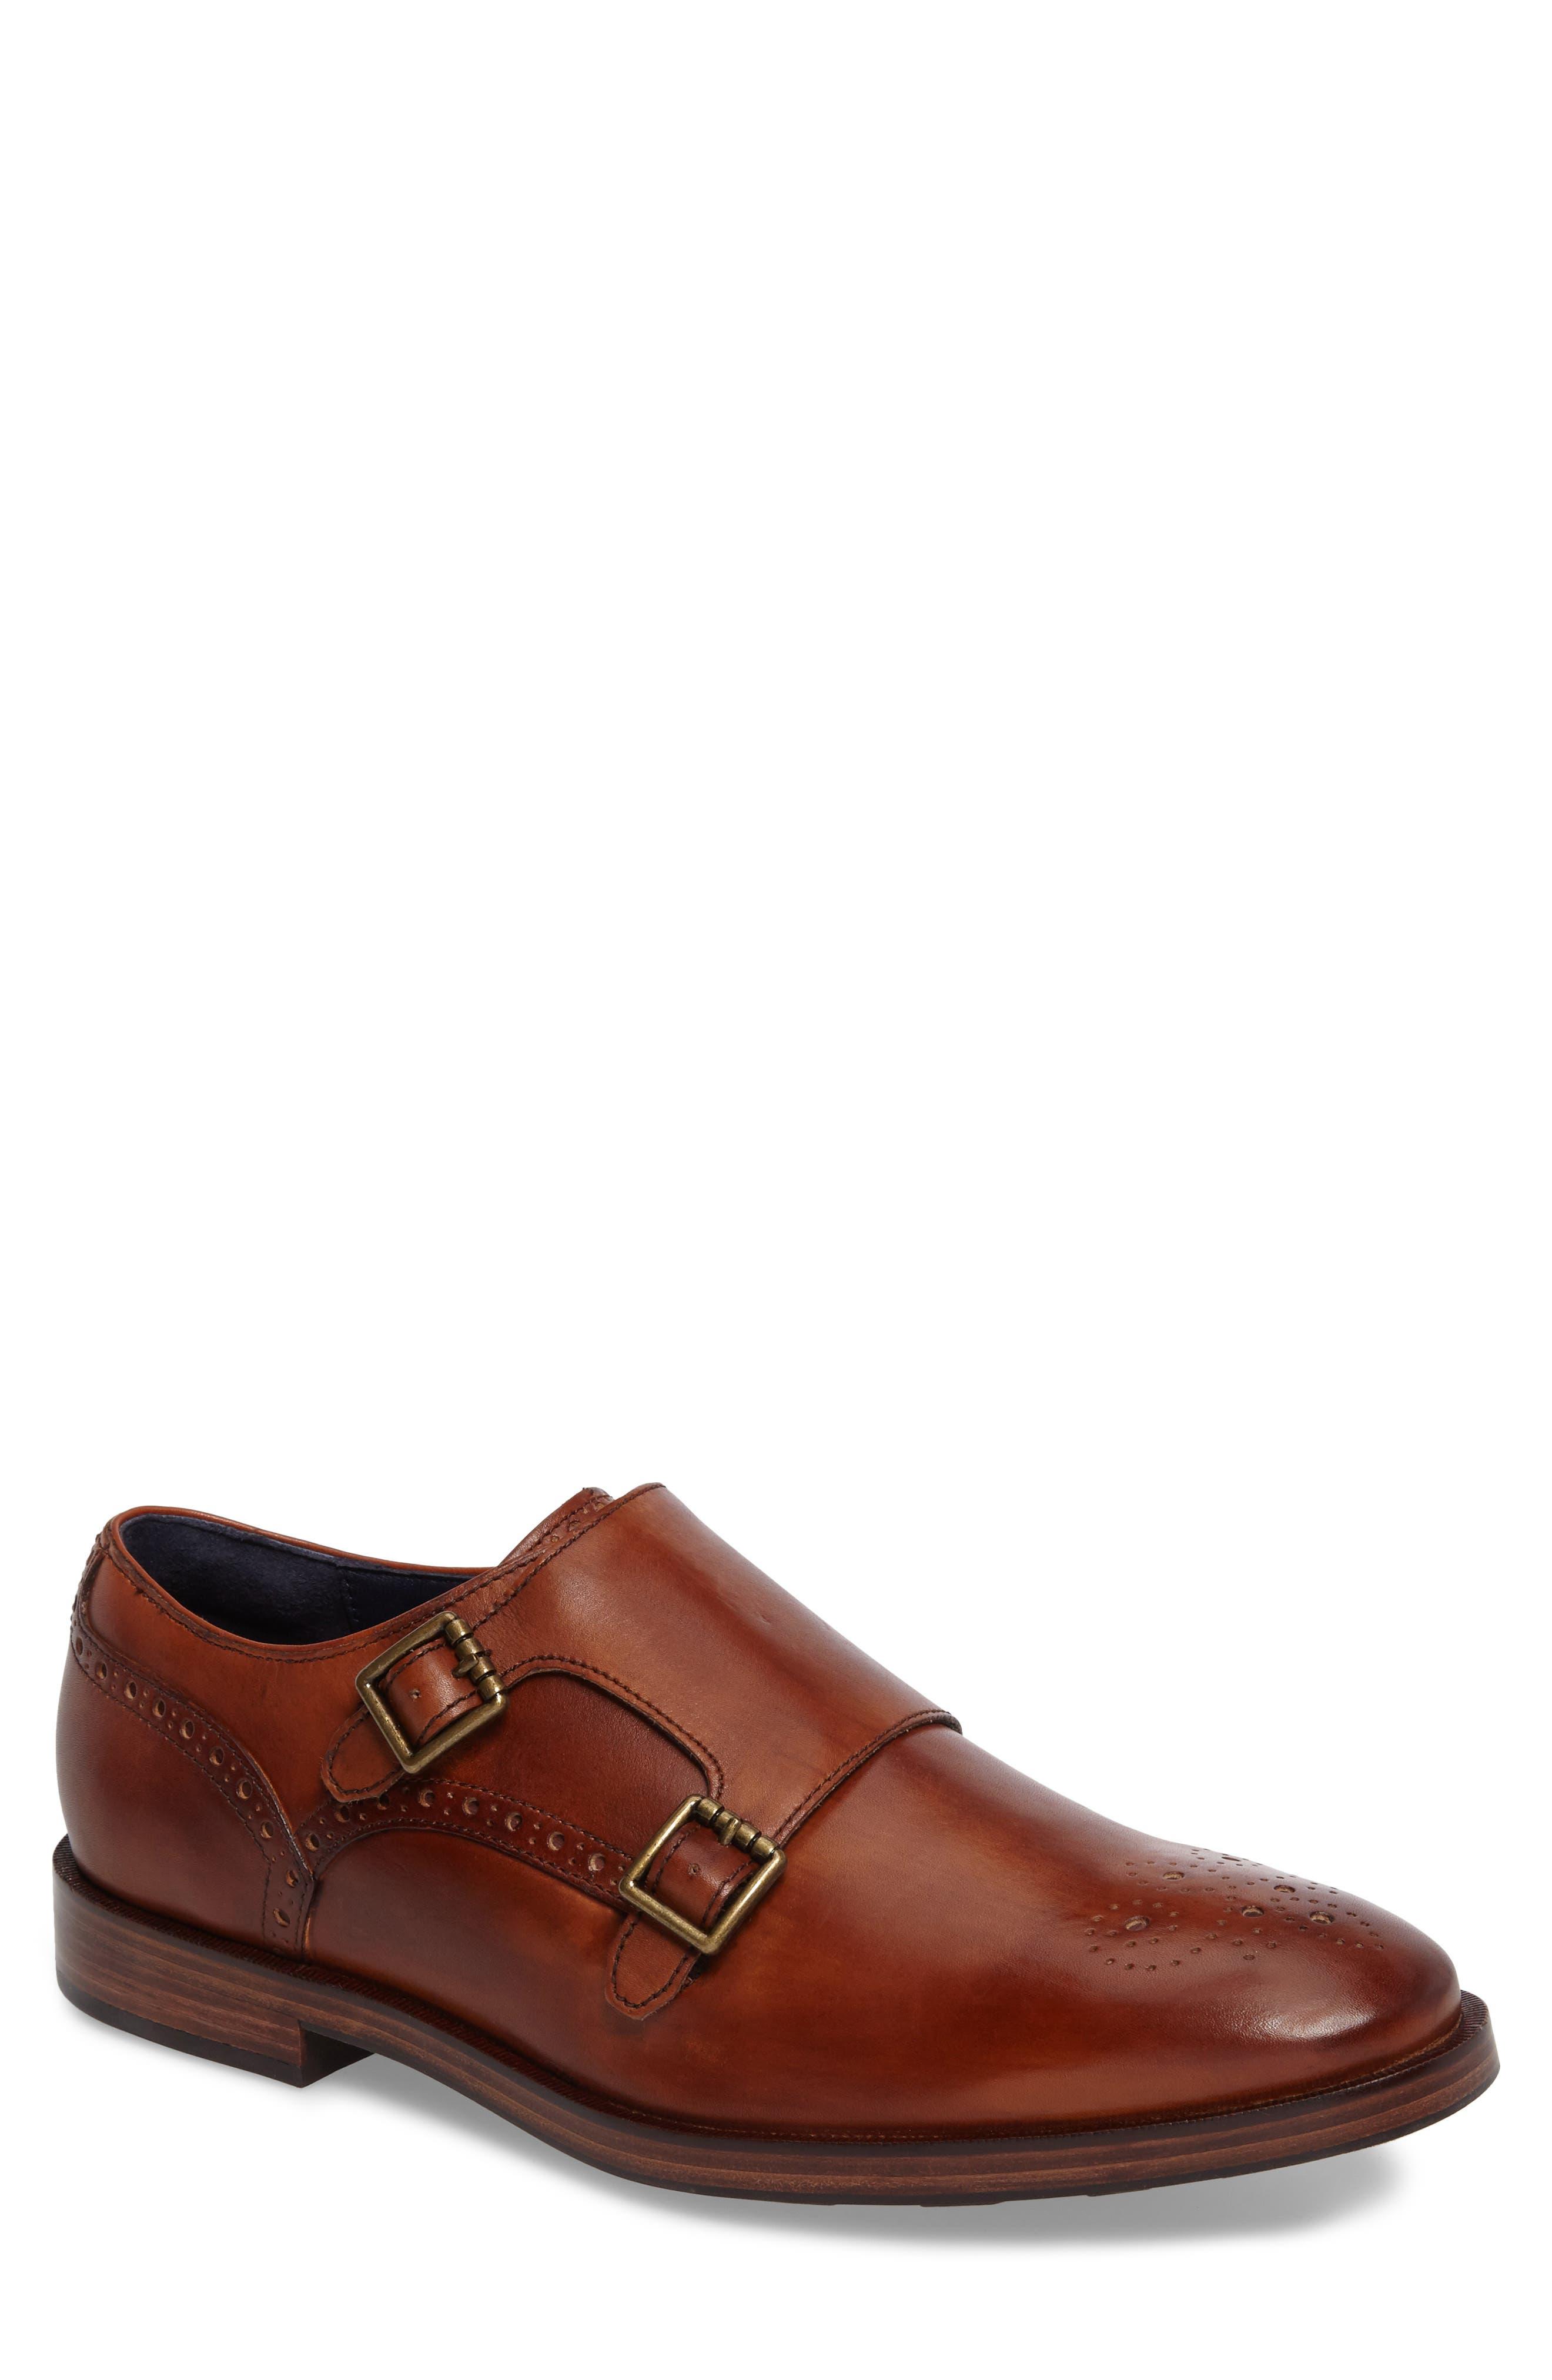 Hamilton Double Monk Strap Shoe,                             Main thumbnail 1, color,                             British Tan Leather